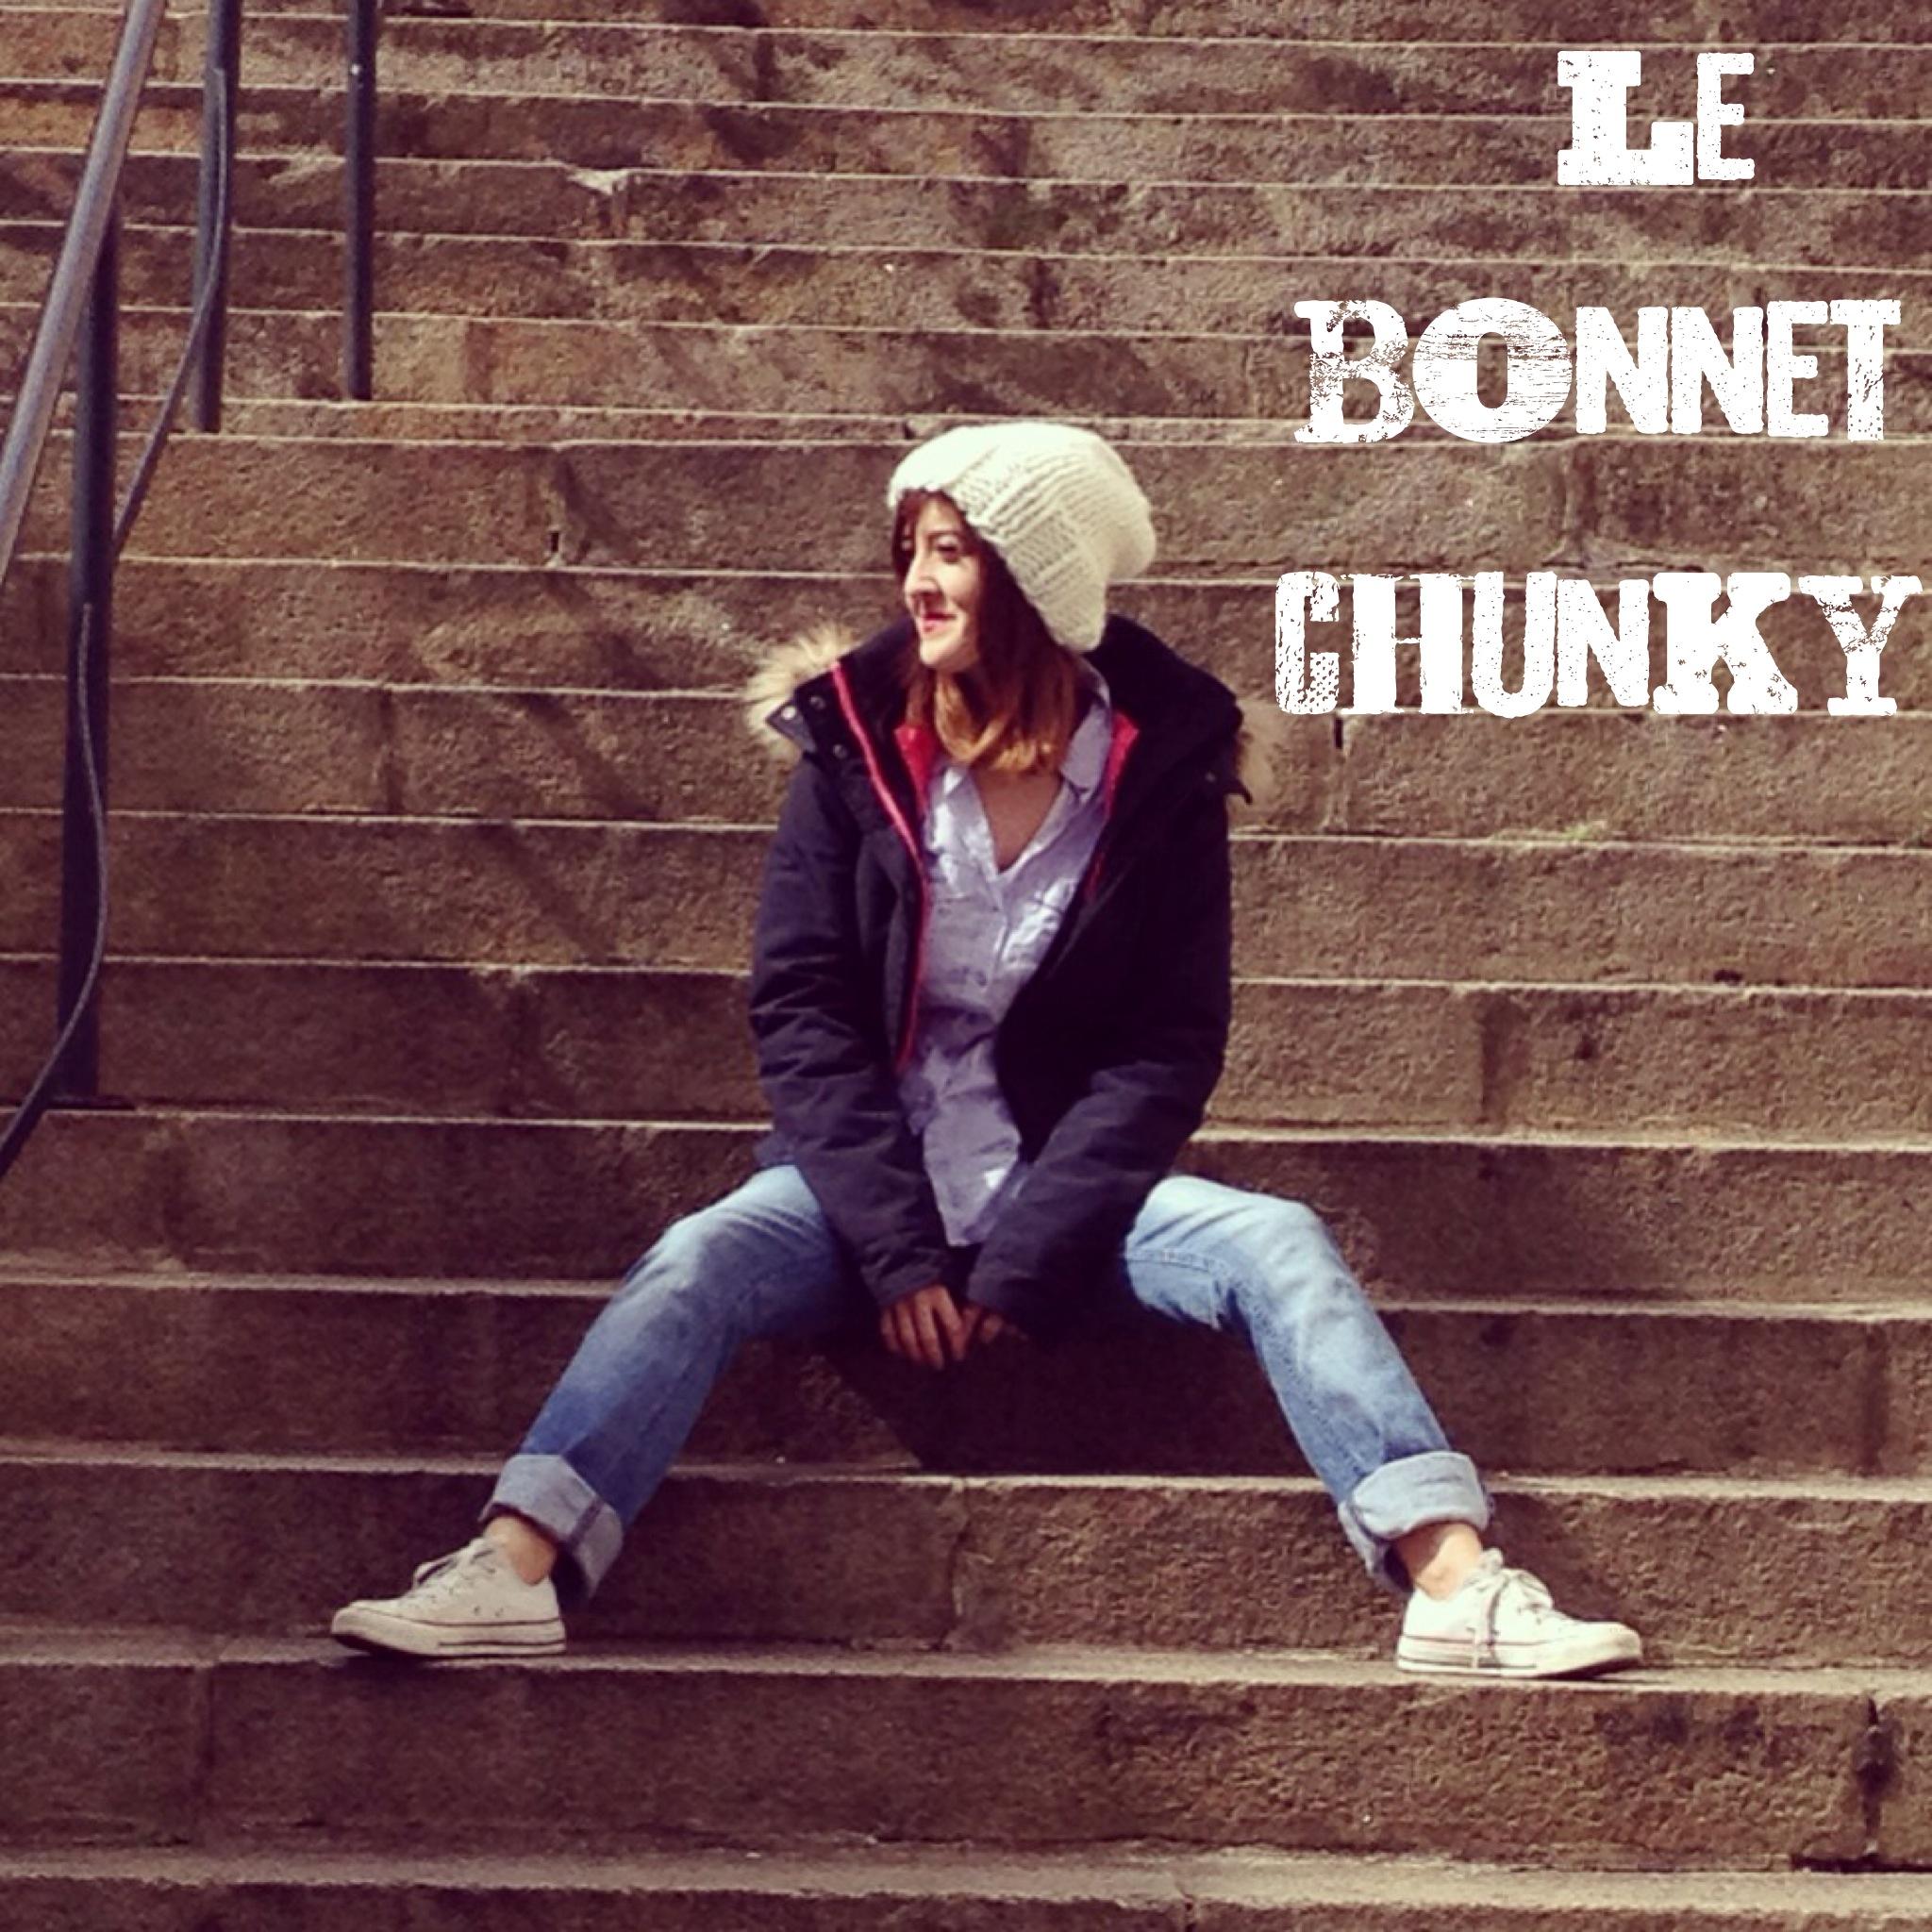 Bonnet chunky